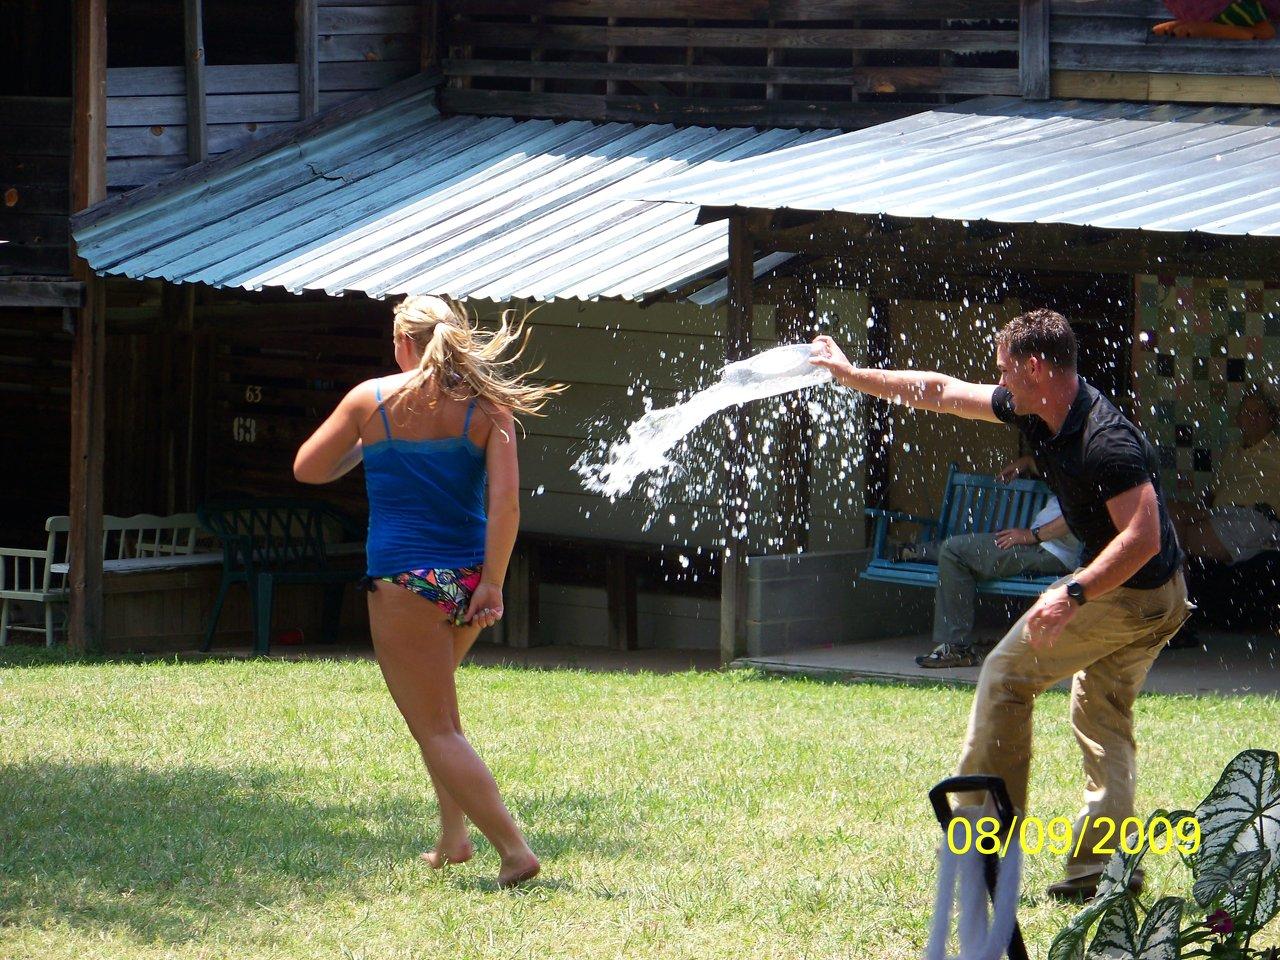 Water fighting 2009